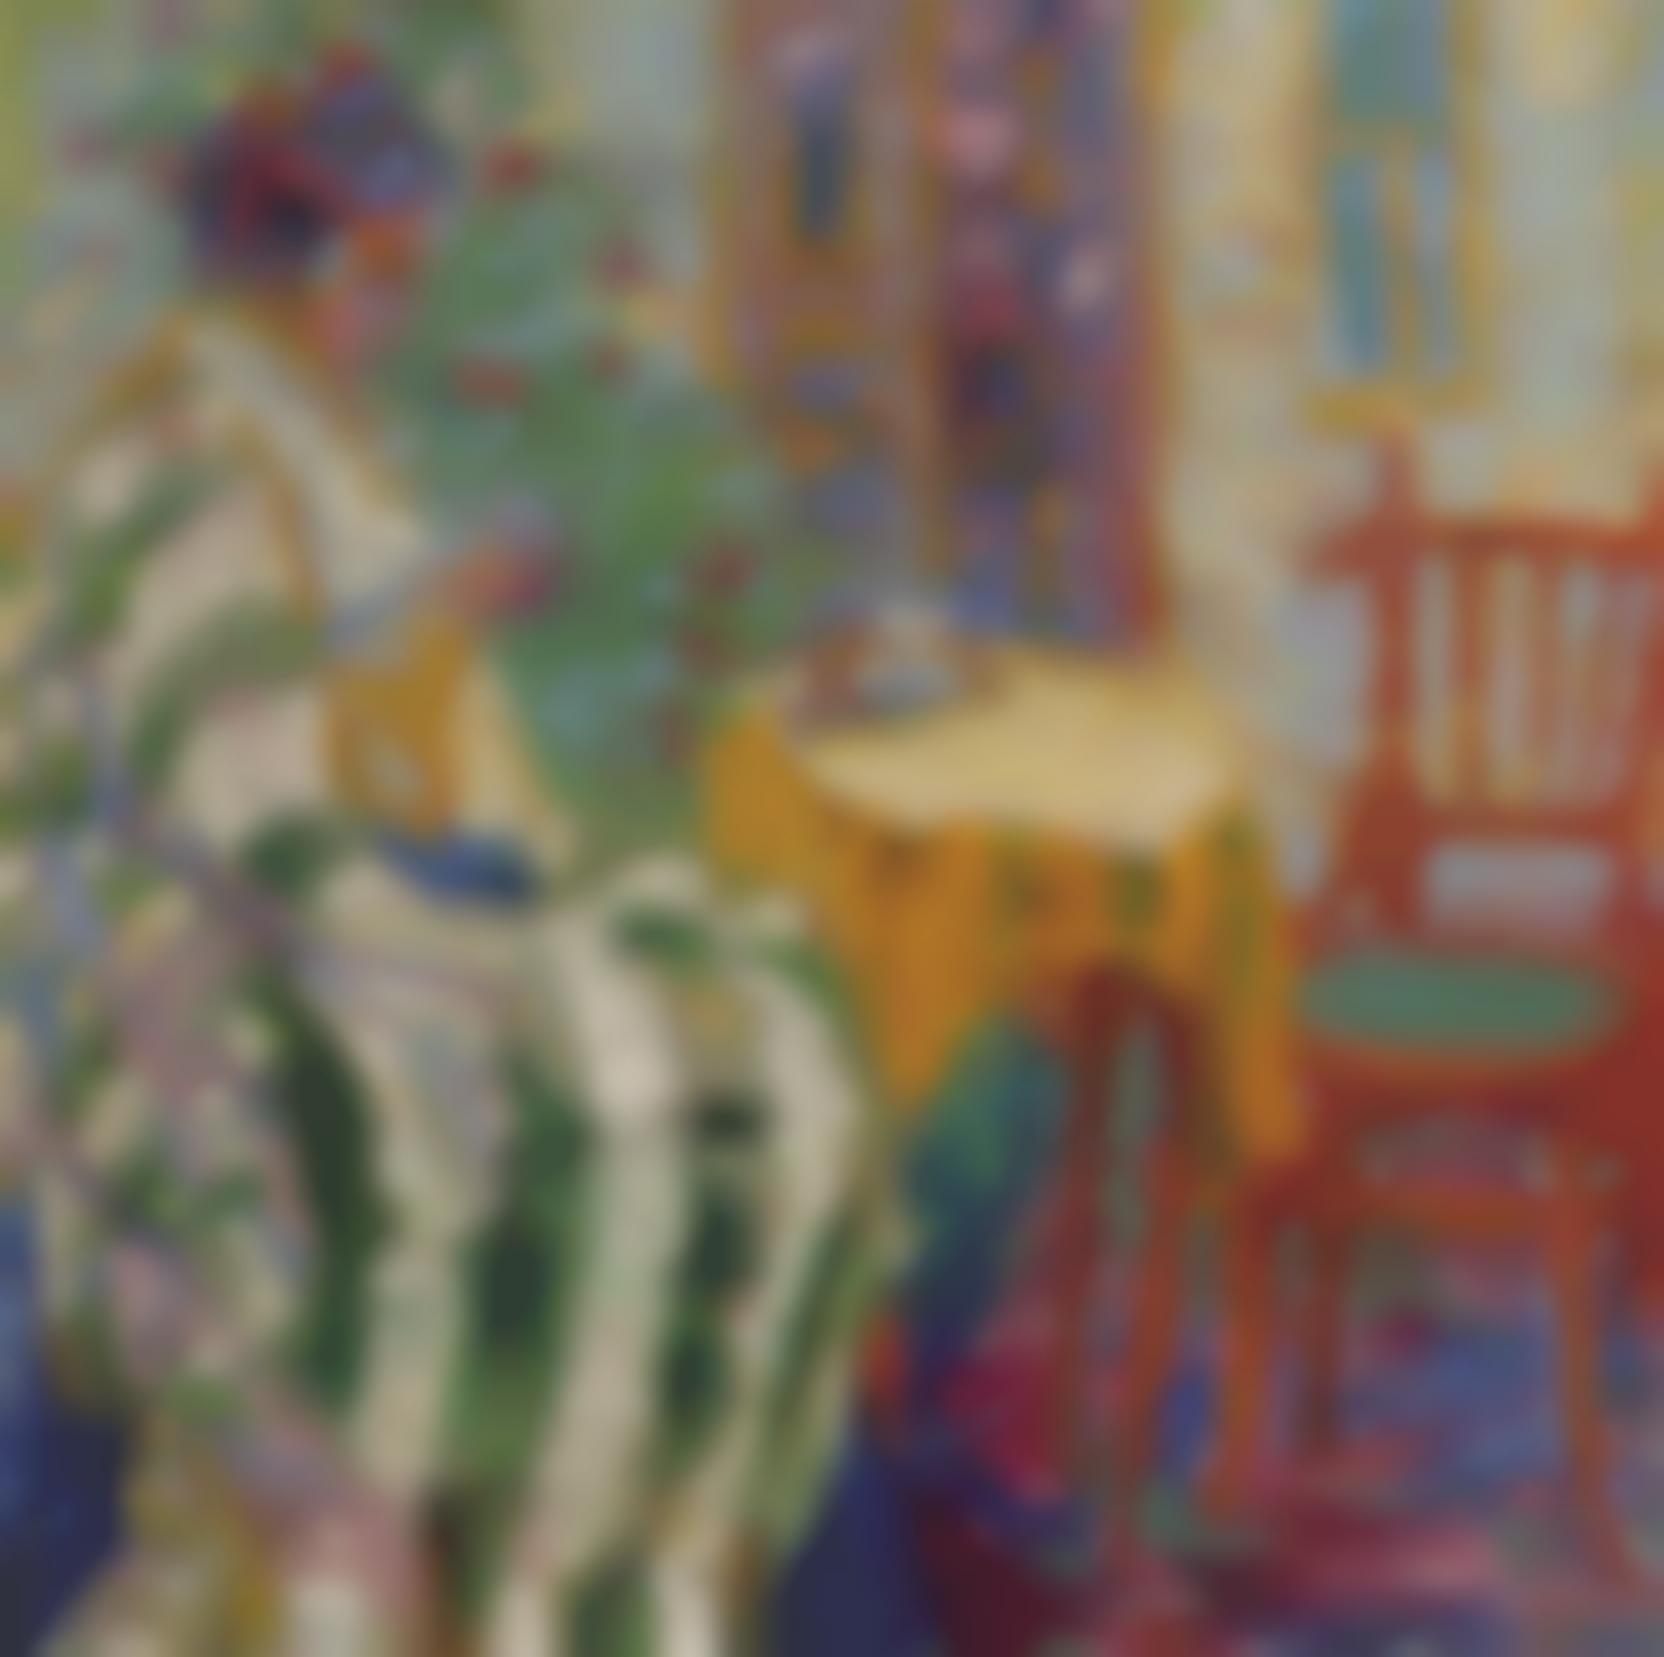 Emil Nolde-Frau Am Kleinen Tisch (Woman At A Small Table)-1906